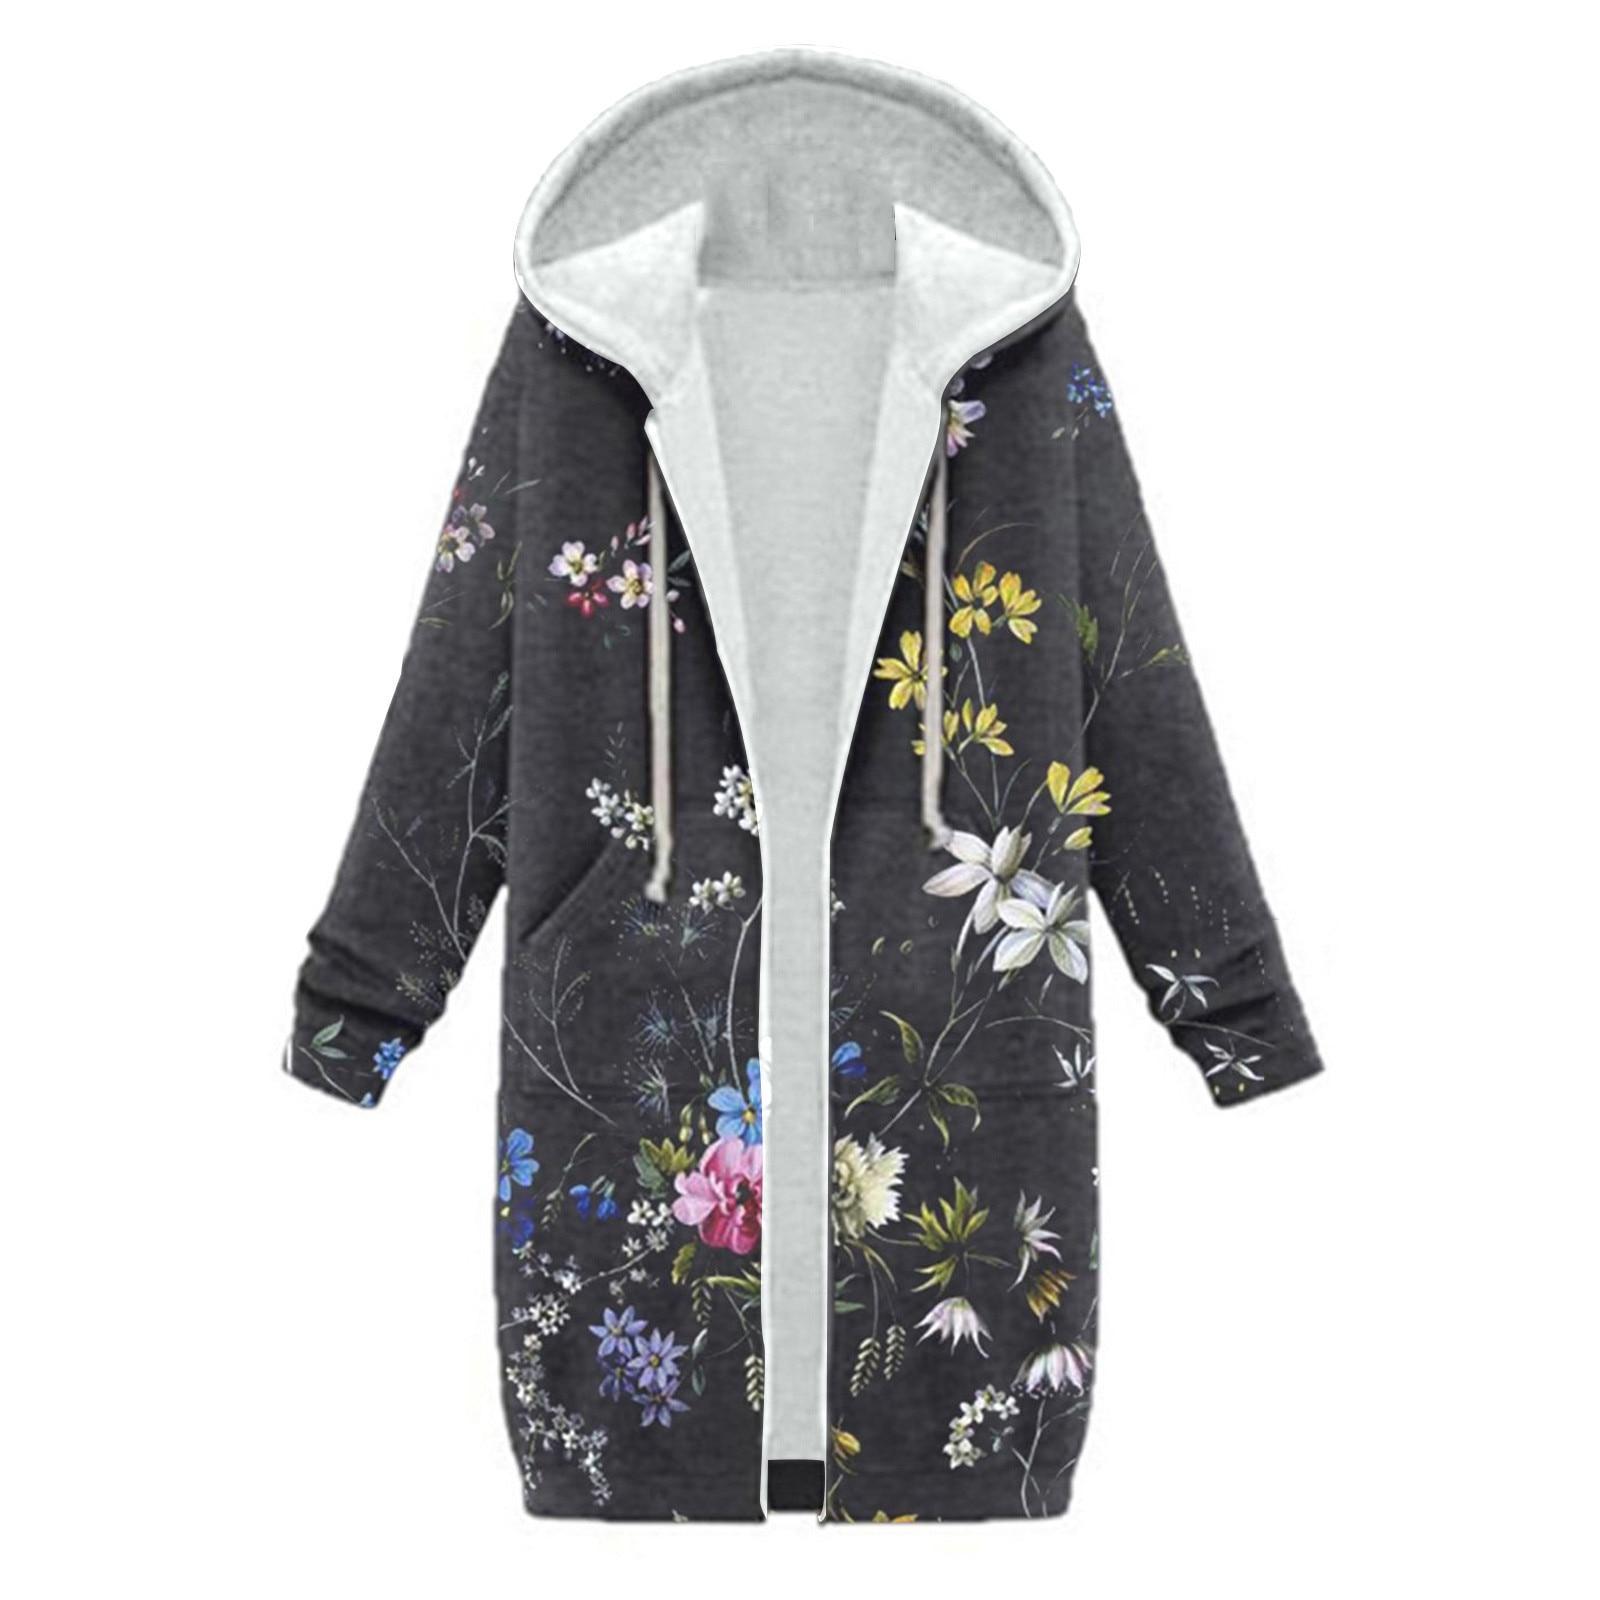 Women Hooded Jackets 2021 Spring Autumn Floral Causal Windbreaker Women Basic Jackets Coats Zipper L